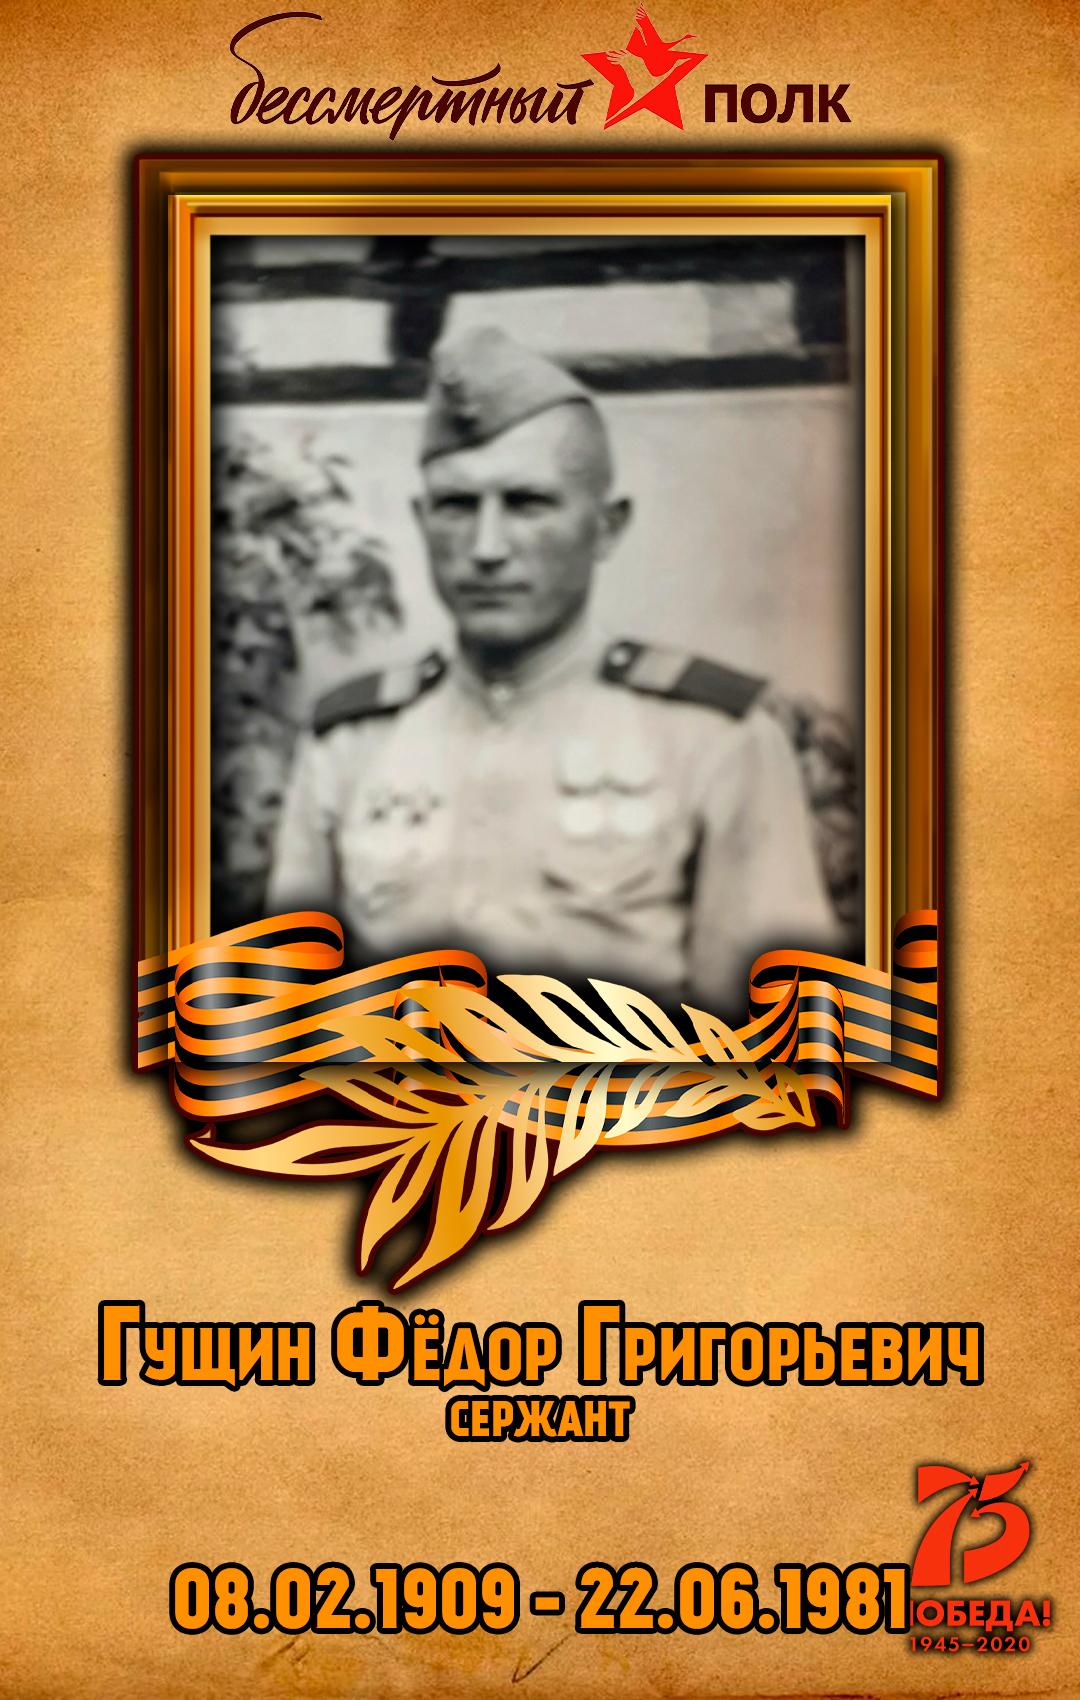 Гущин-Фёдор-Григорьевич